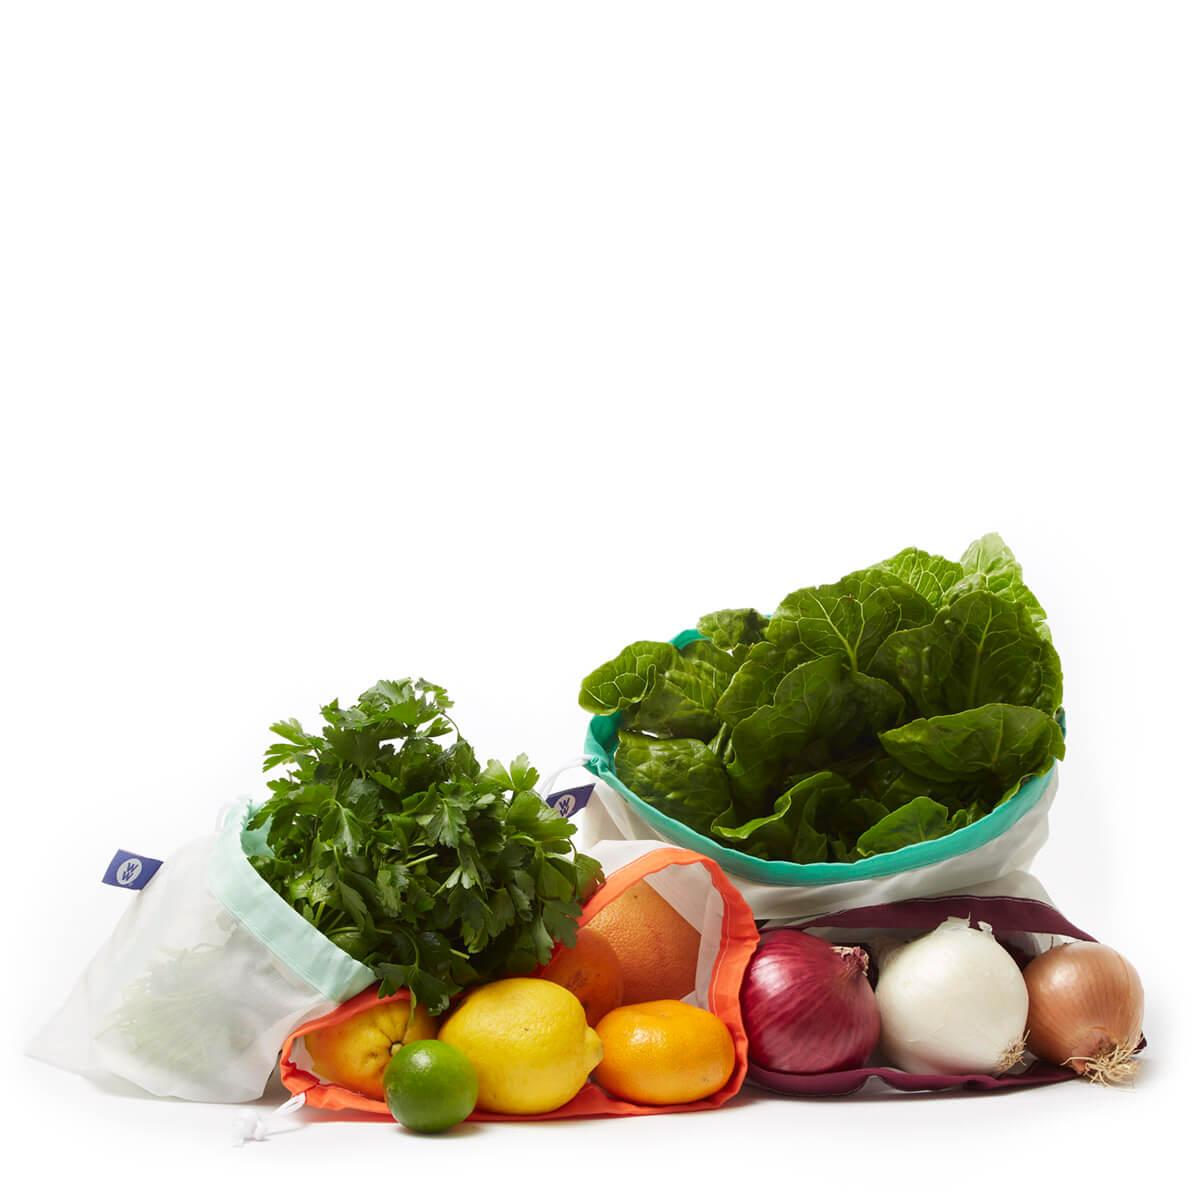 WW Reusable Produce Bags - lifestyle